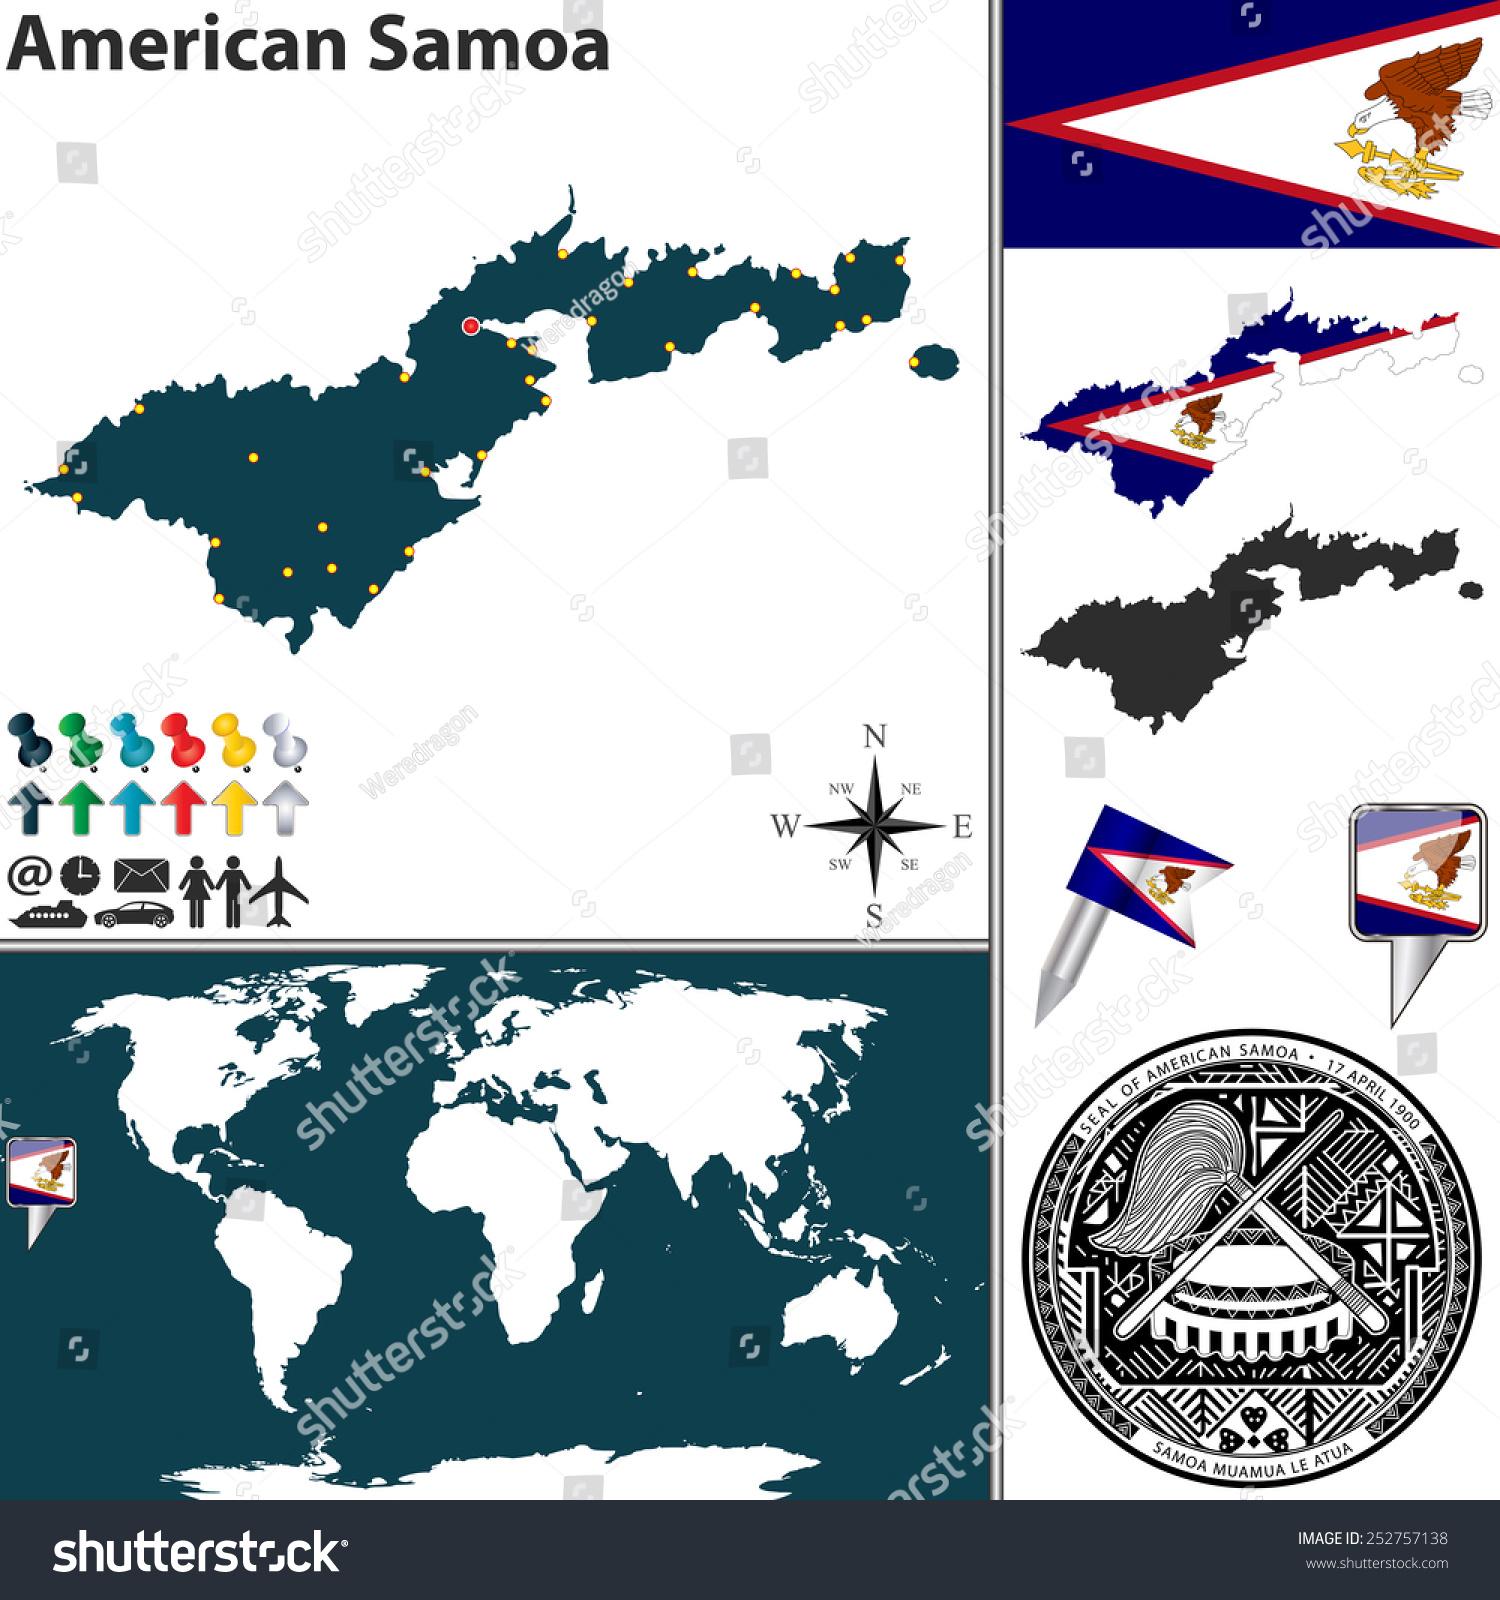 Maps Update 780323 American Samoa Location on World Map Samoa – American Samoa Map World